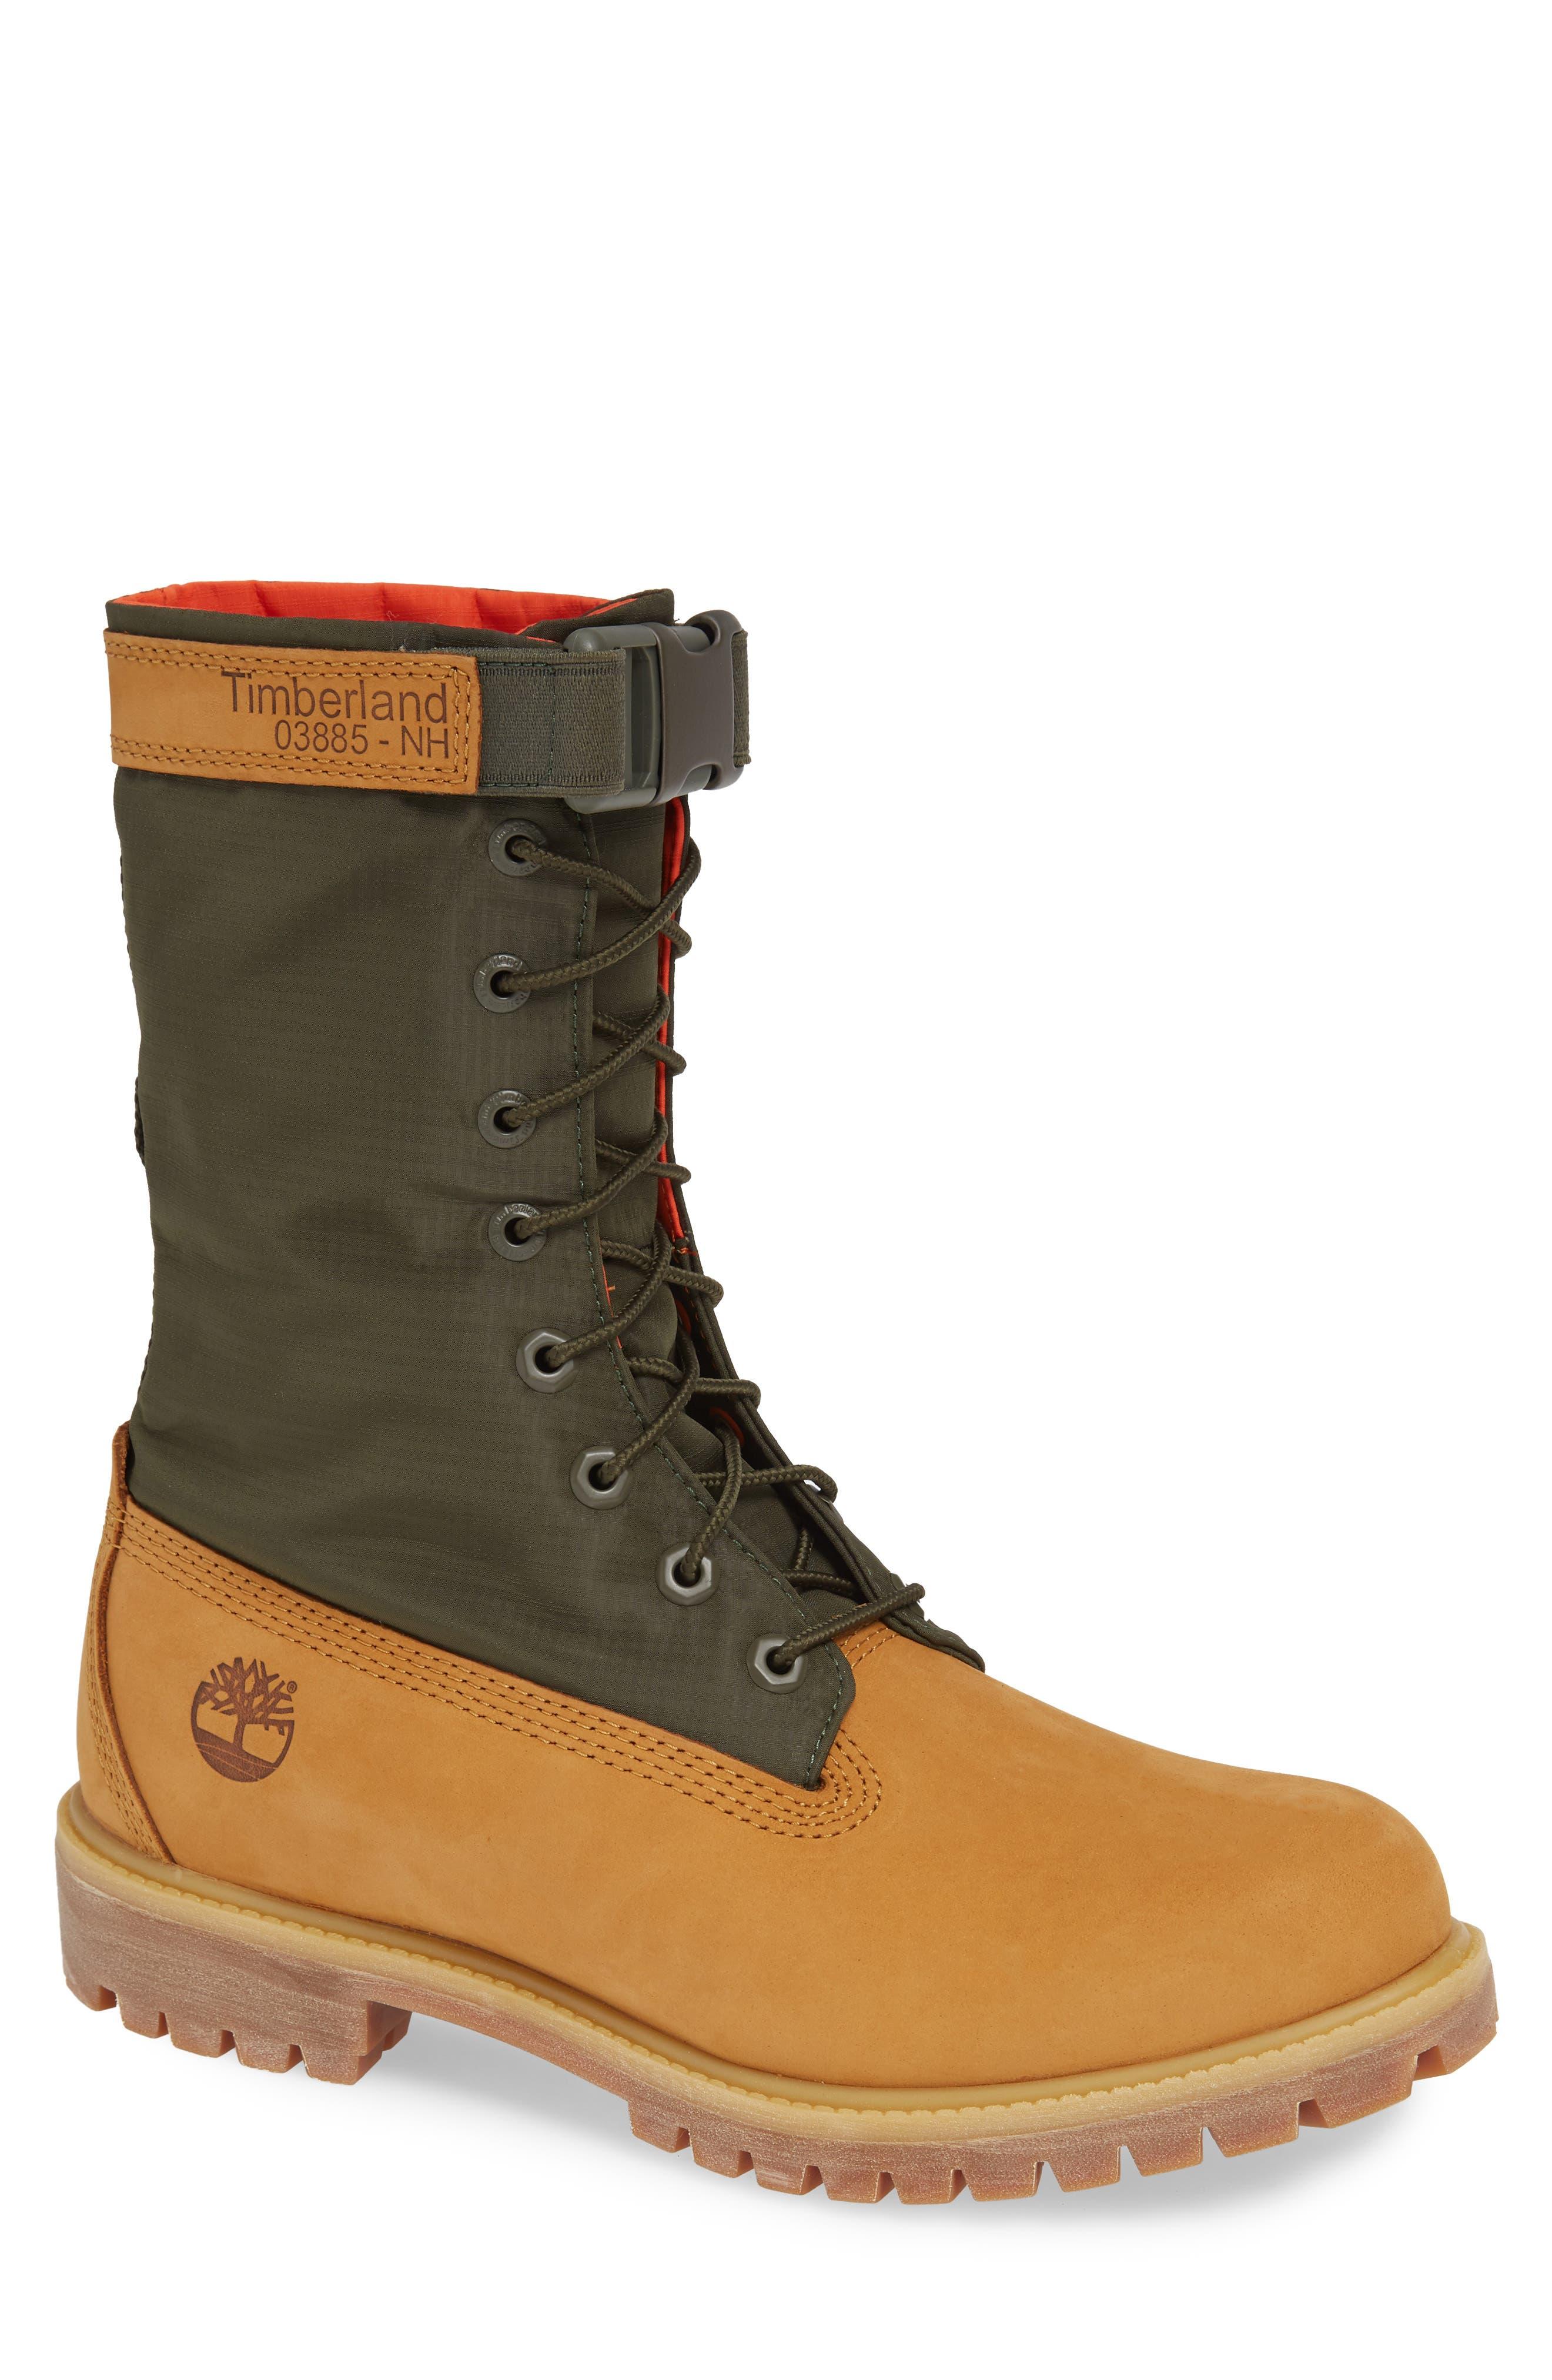 TIMBERLAND,                             Premium Gaiter Plain Toe Boot,                             Main thumbnail 1, color,                             231